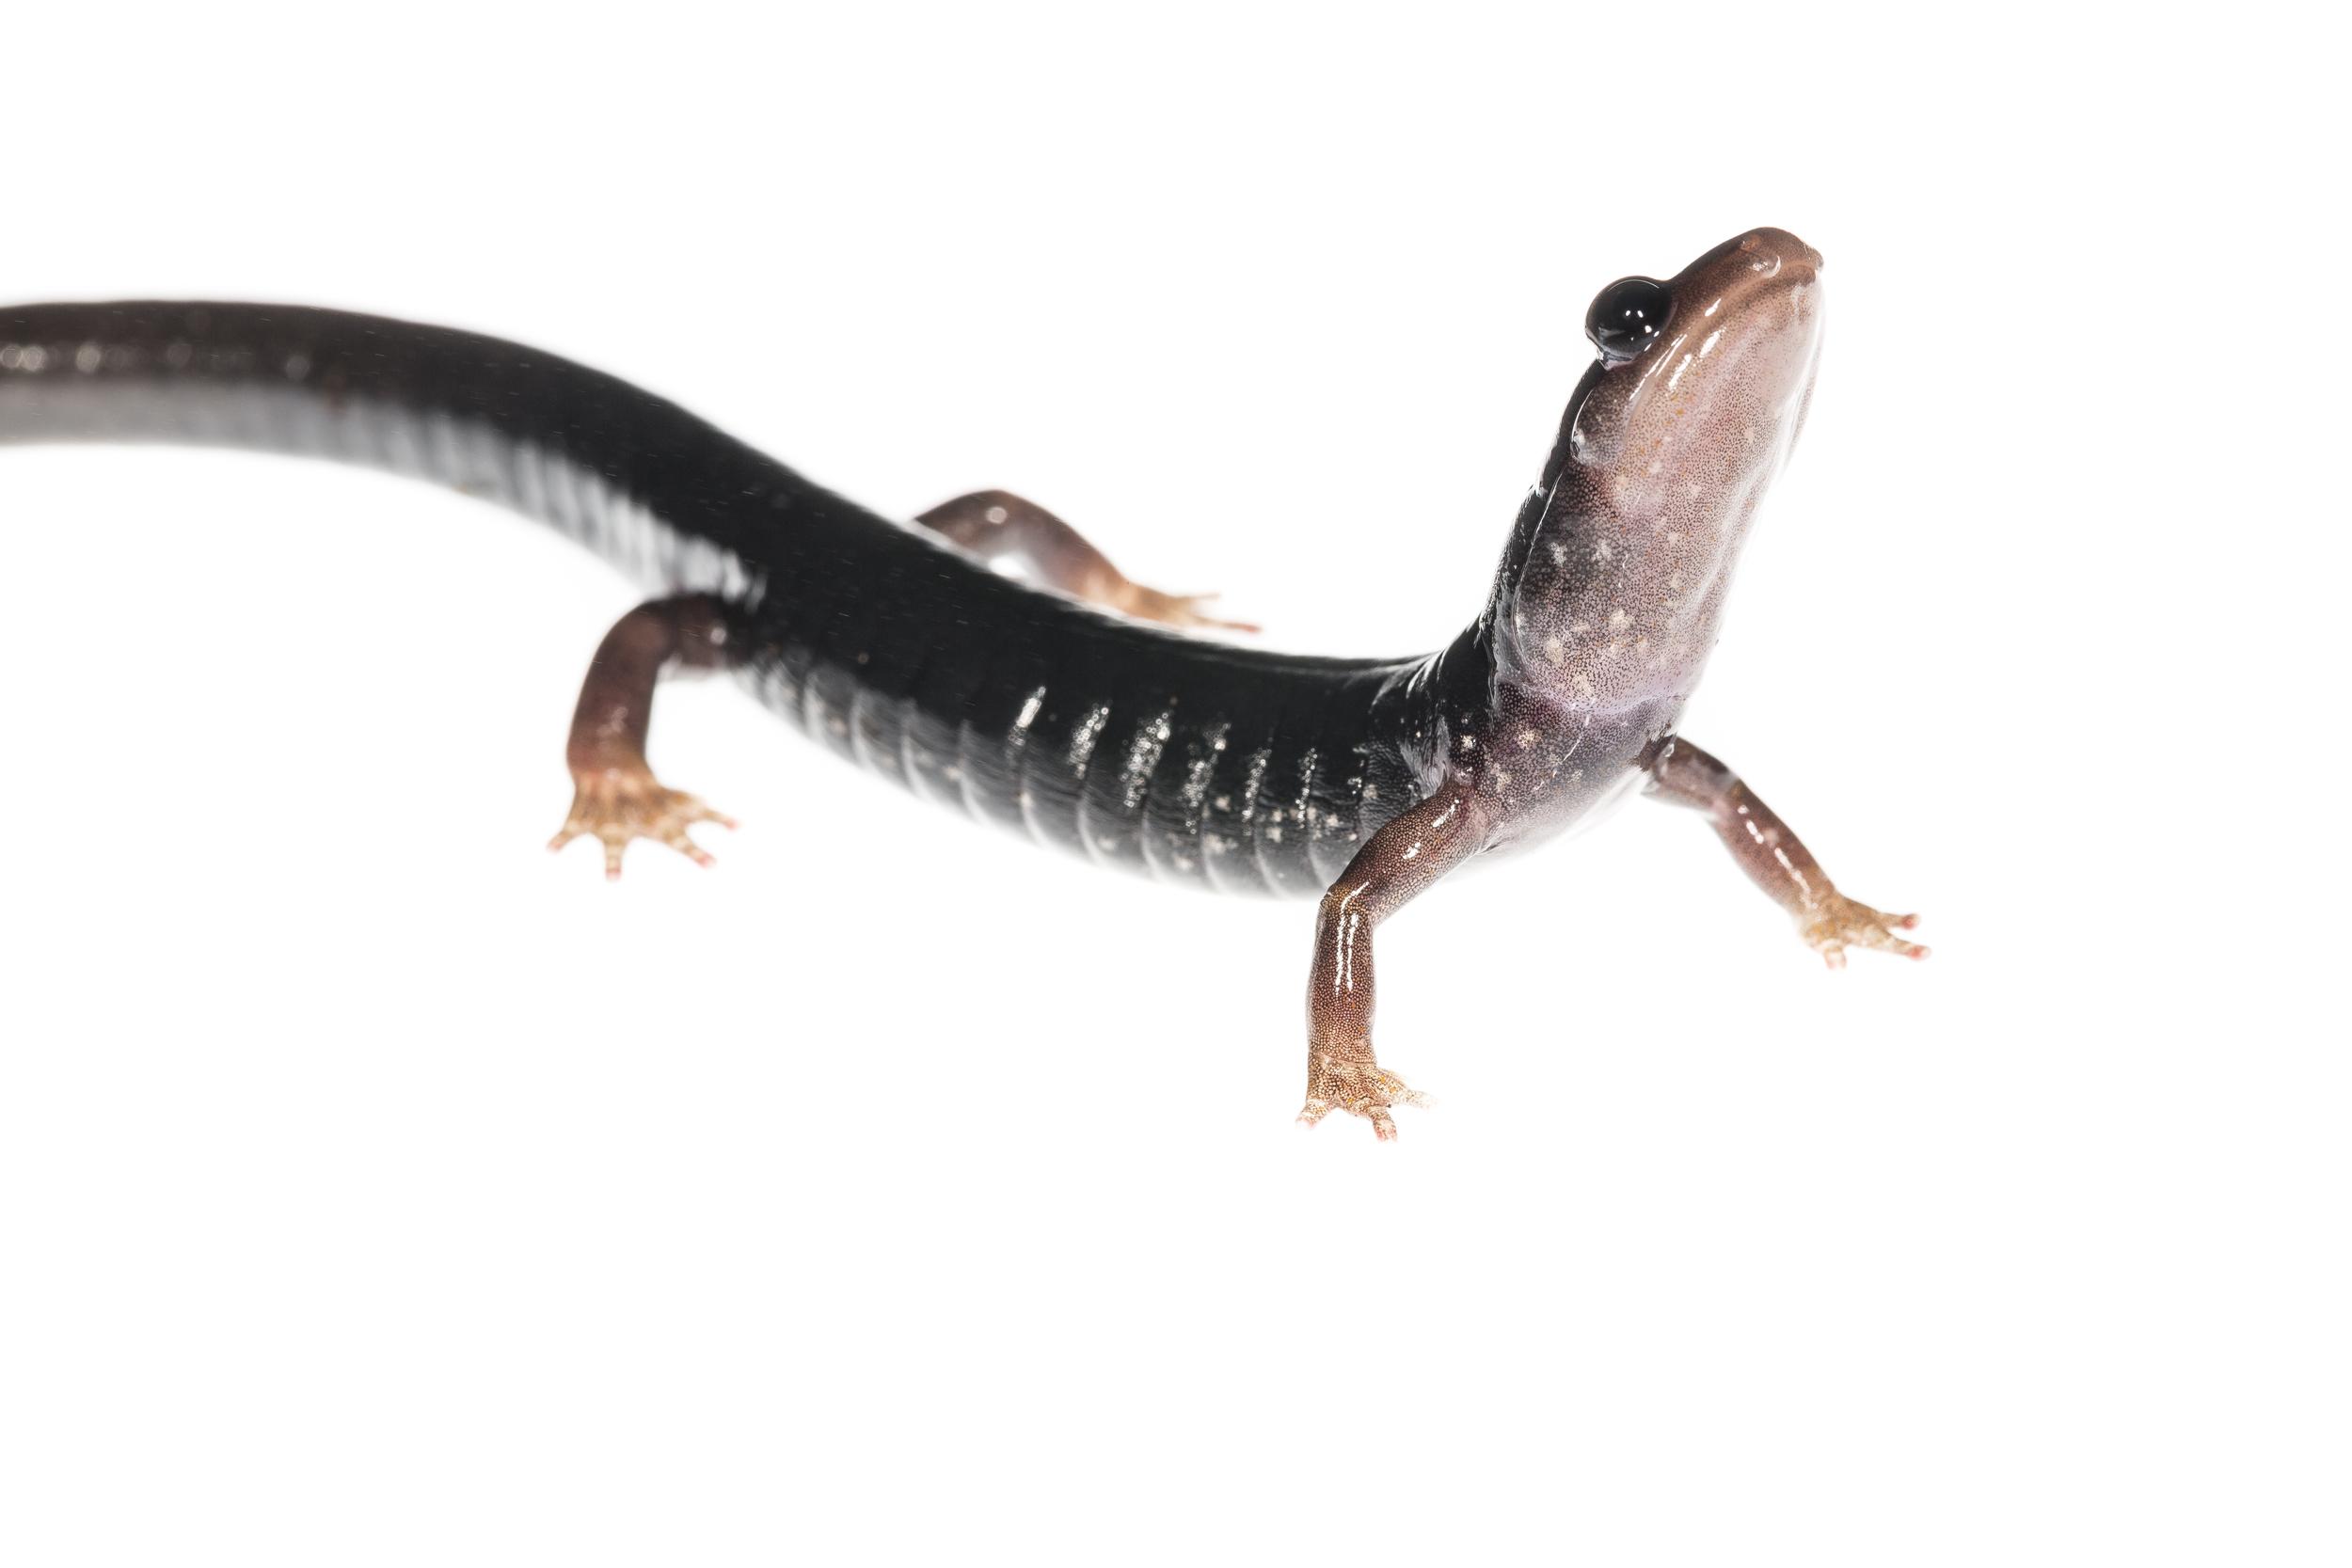 Southern Appalachian Salamander - Plethodon teyahalee